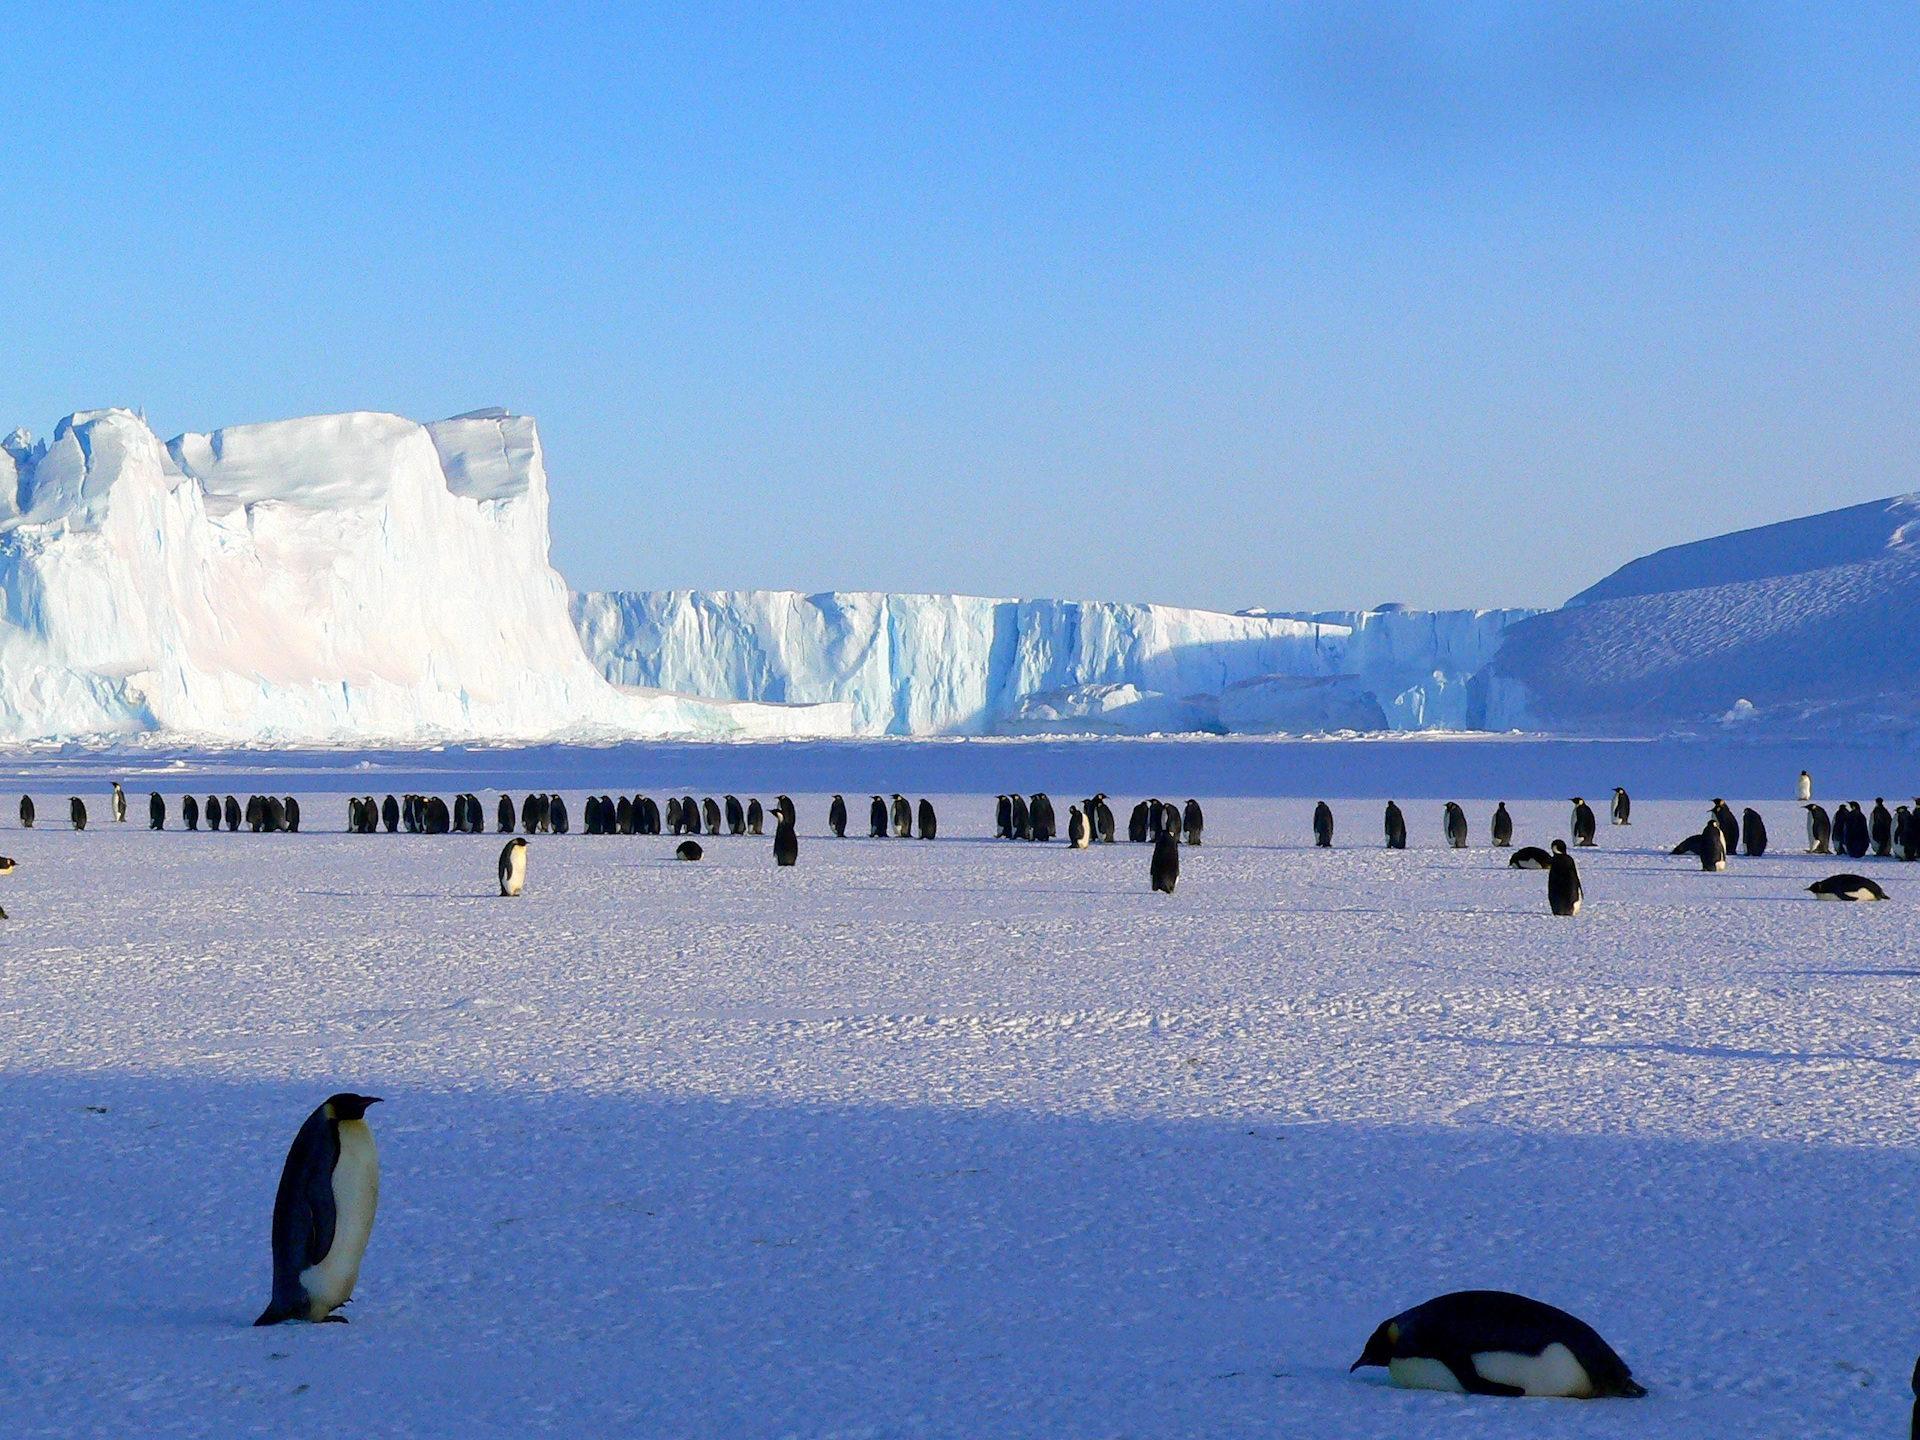 Pinguine, Kaiser, Antarktis, Eis, Polar - Wallpaper HD - Prof.-falken.com